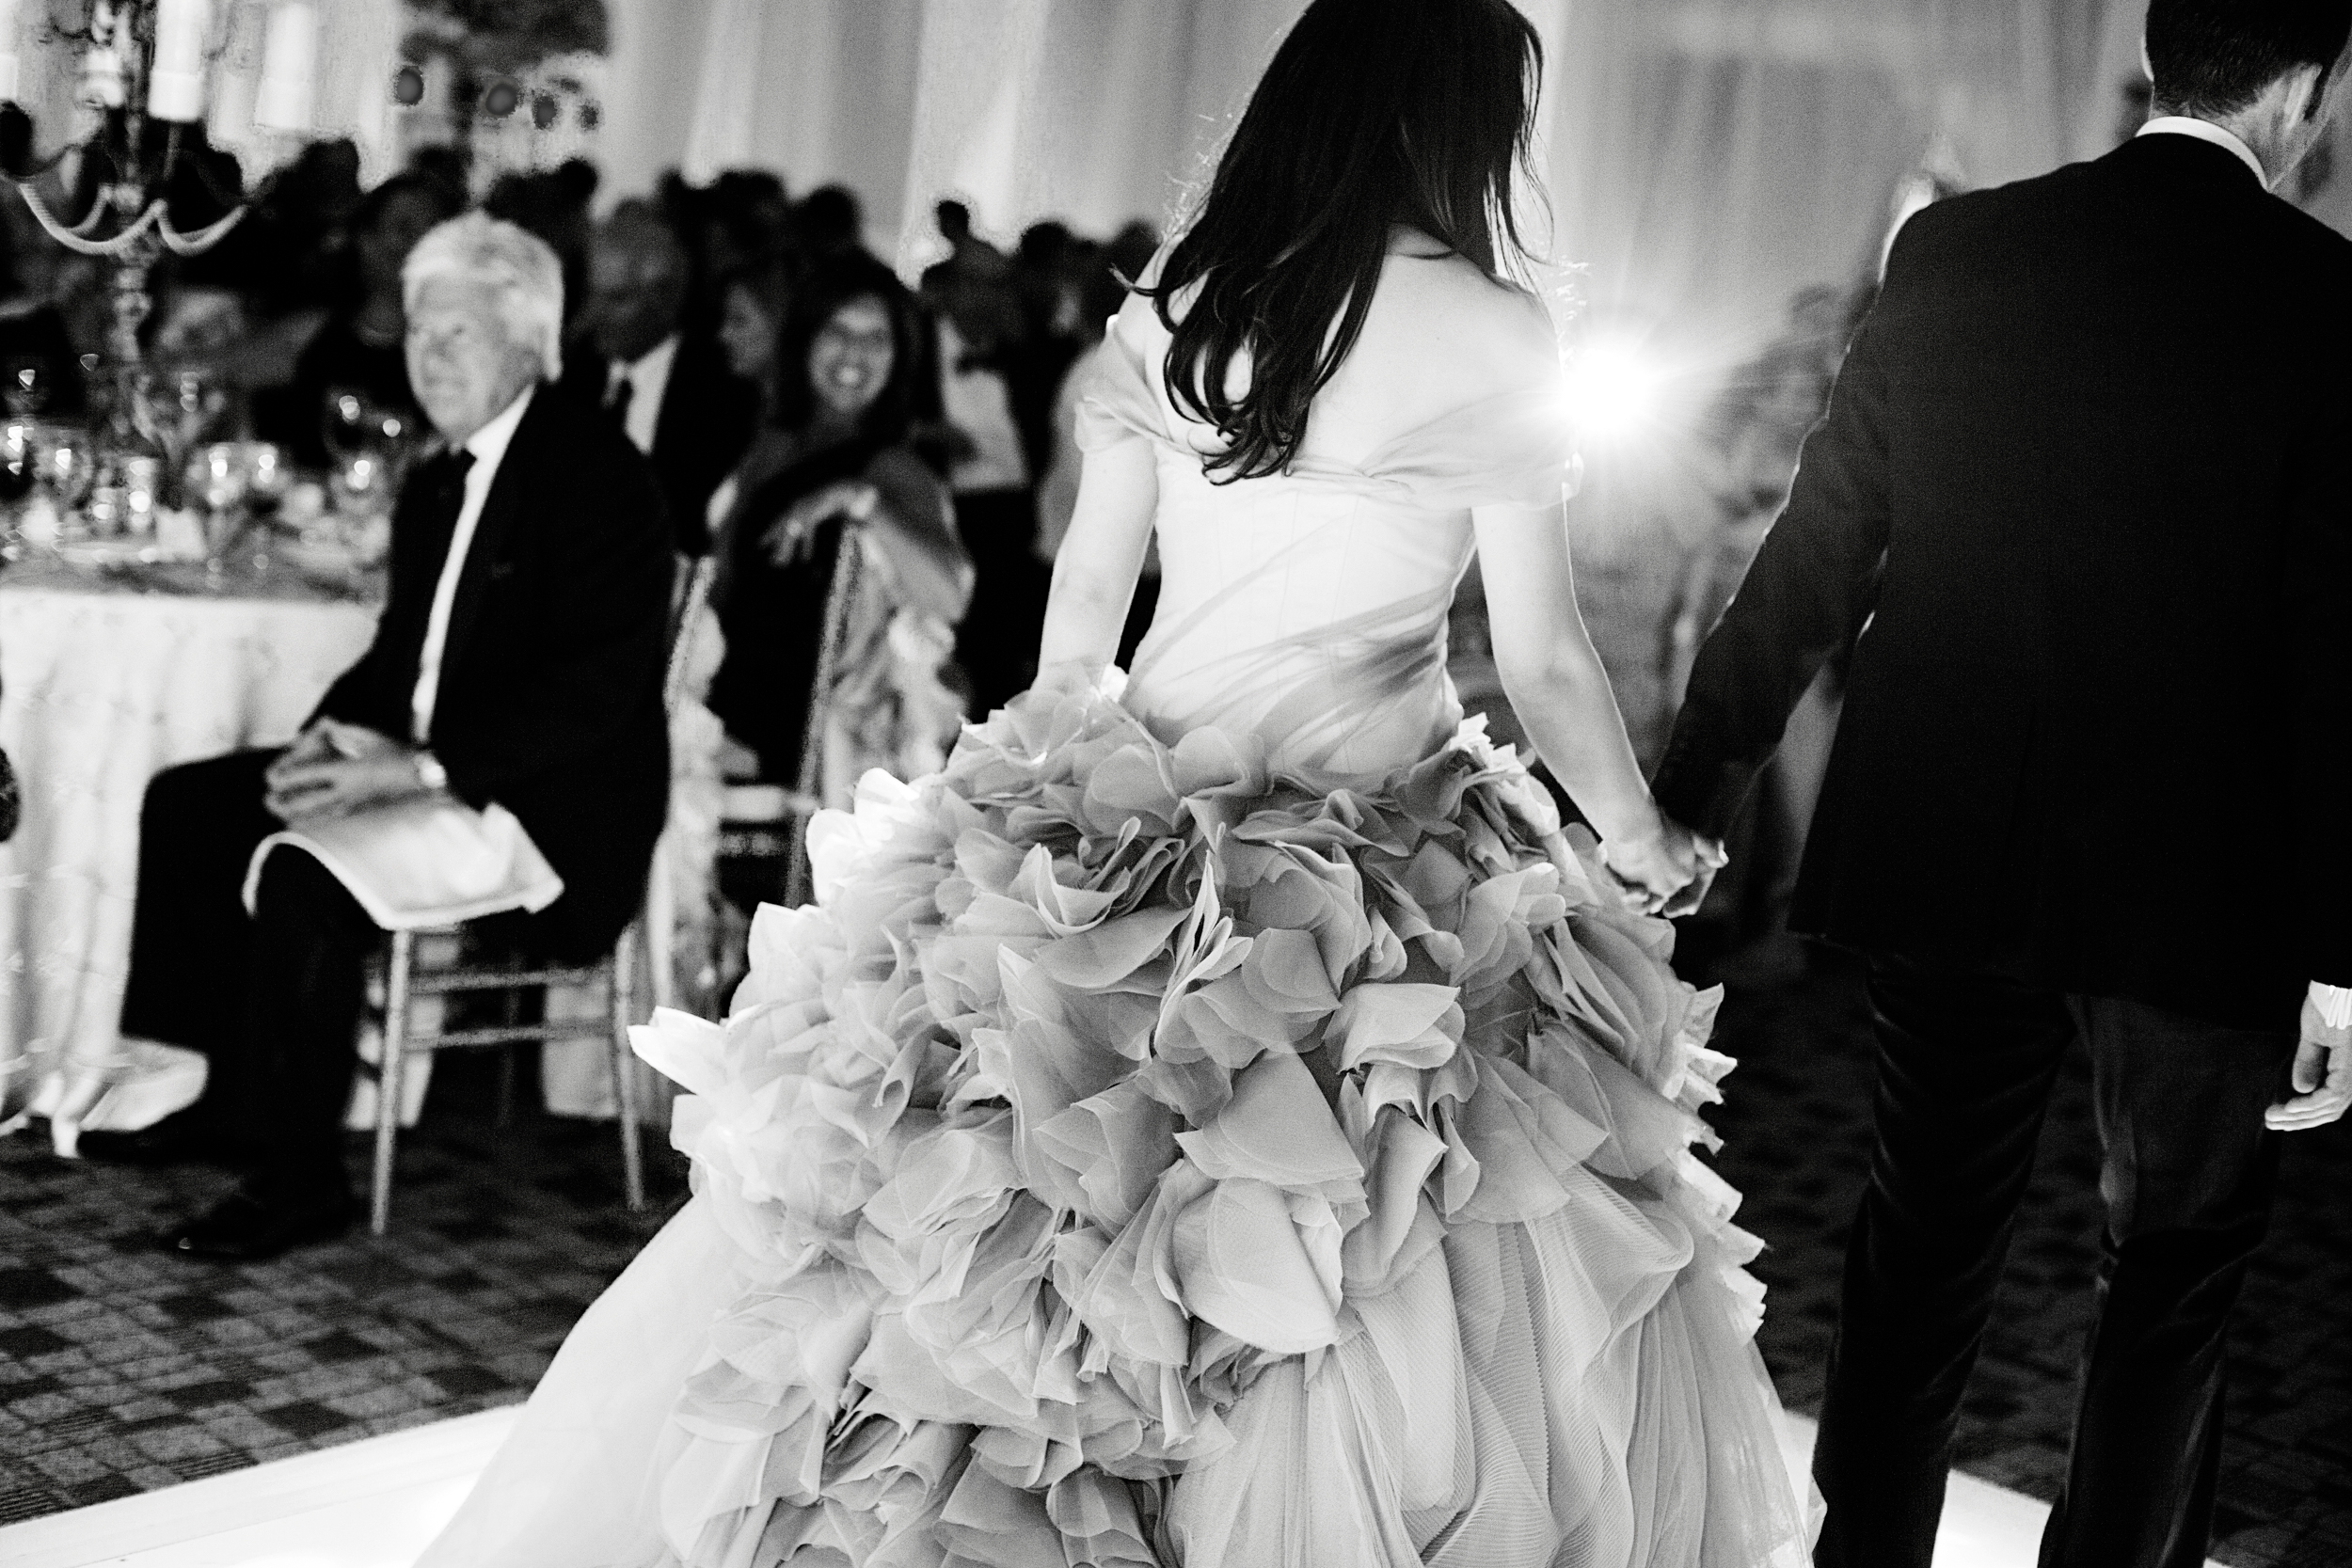 Ceci_New_York_Ceci_Style_Ceci_Johnson_Luxury_Lifestyle_Floral_Lace_Wedding_Letterpress_Inspiration_Design_Custom_Couture_Personalized_Invitations_-21.jpg